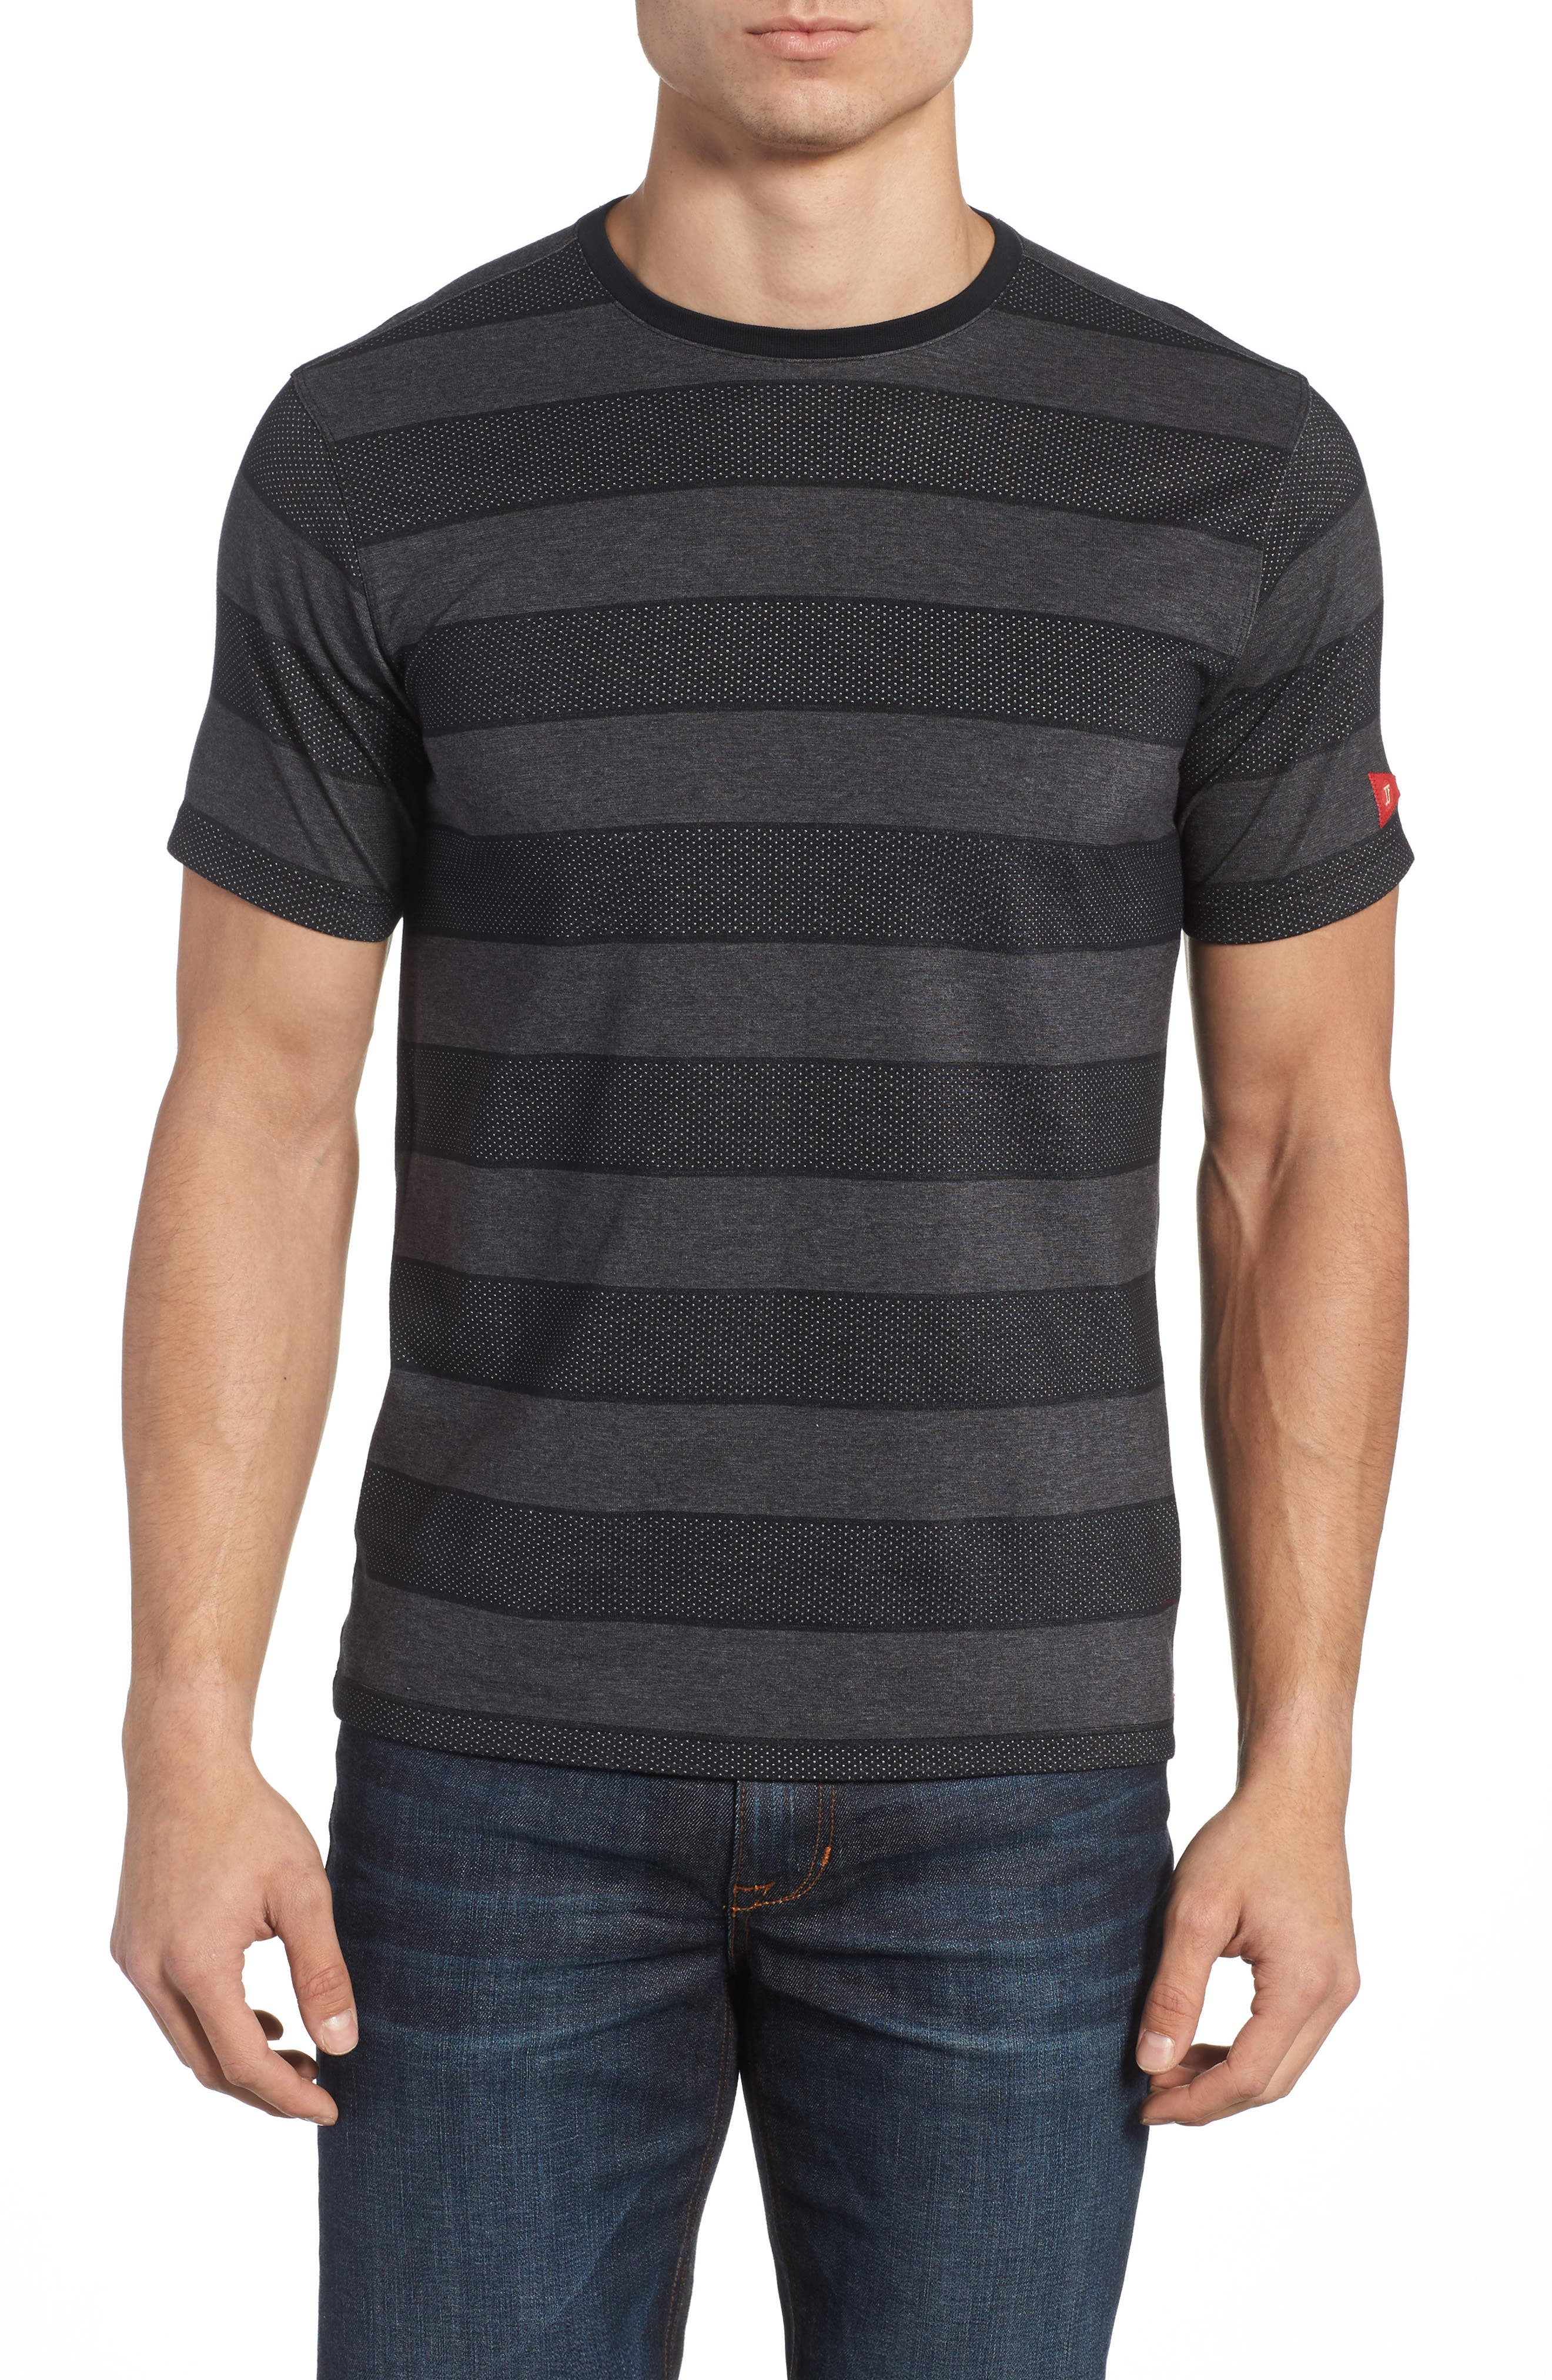 Main Image - Hurley Regatta Dri-FIT T-Shirt